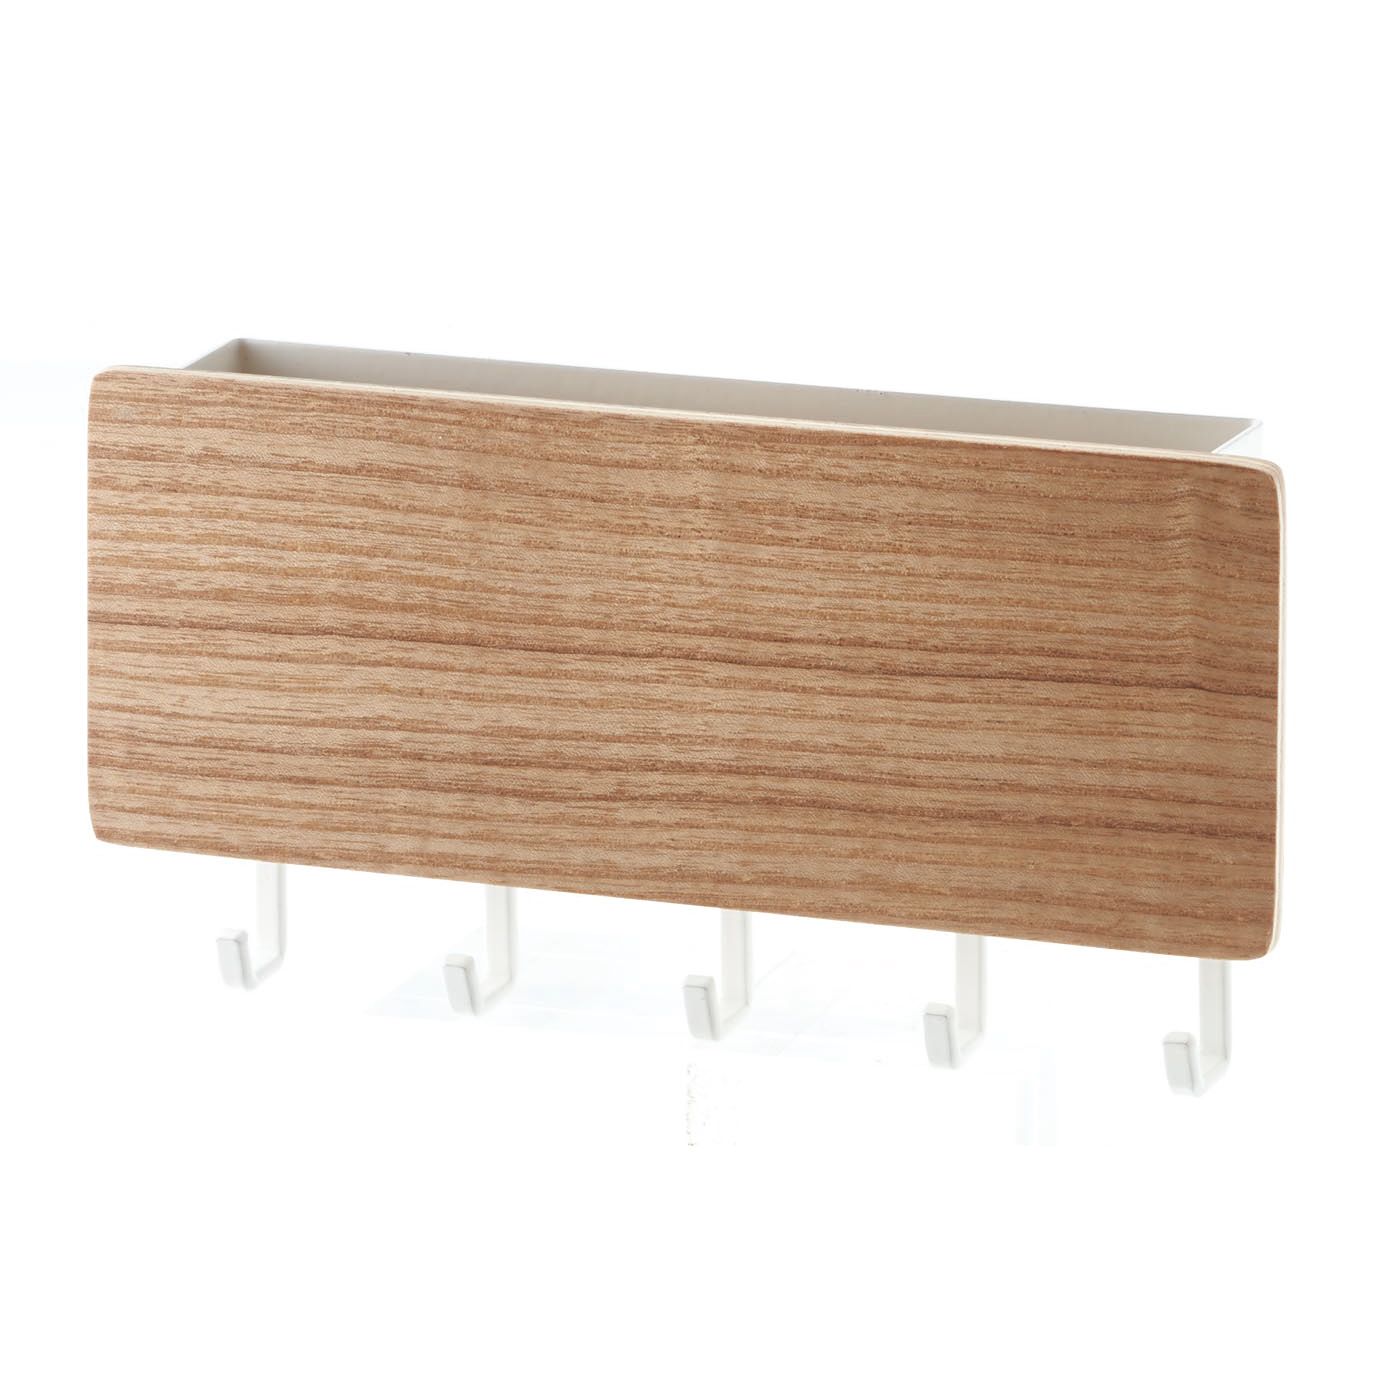 Magnetic caddy   5 hook organizer. Home Goods Online Shop   Huckberry